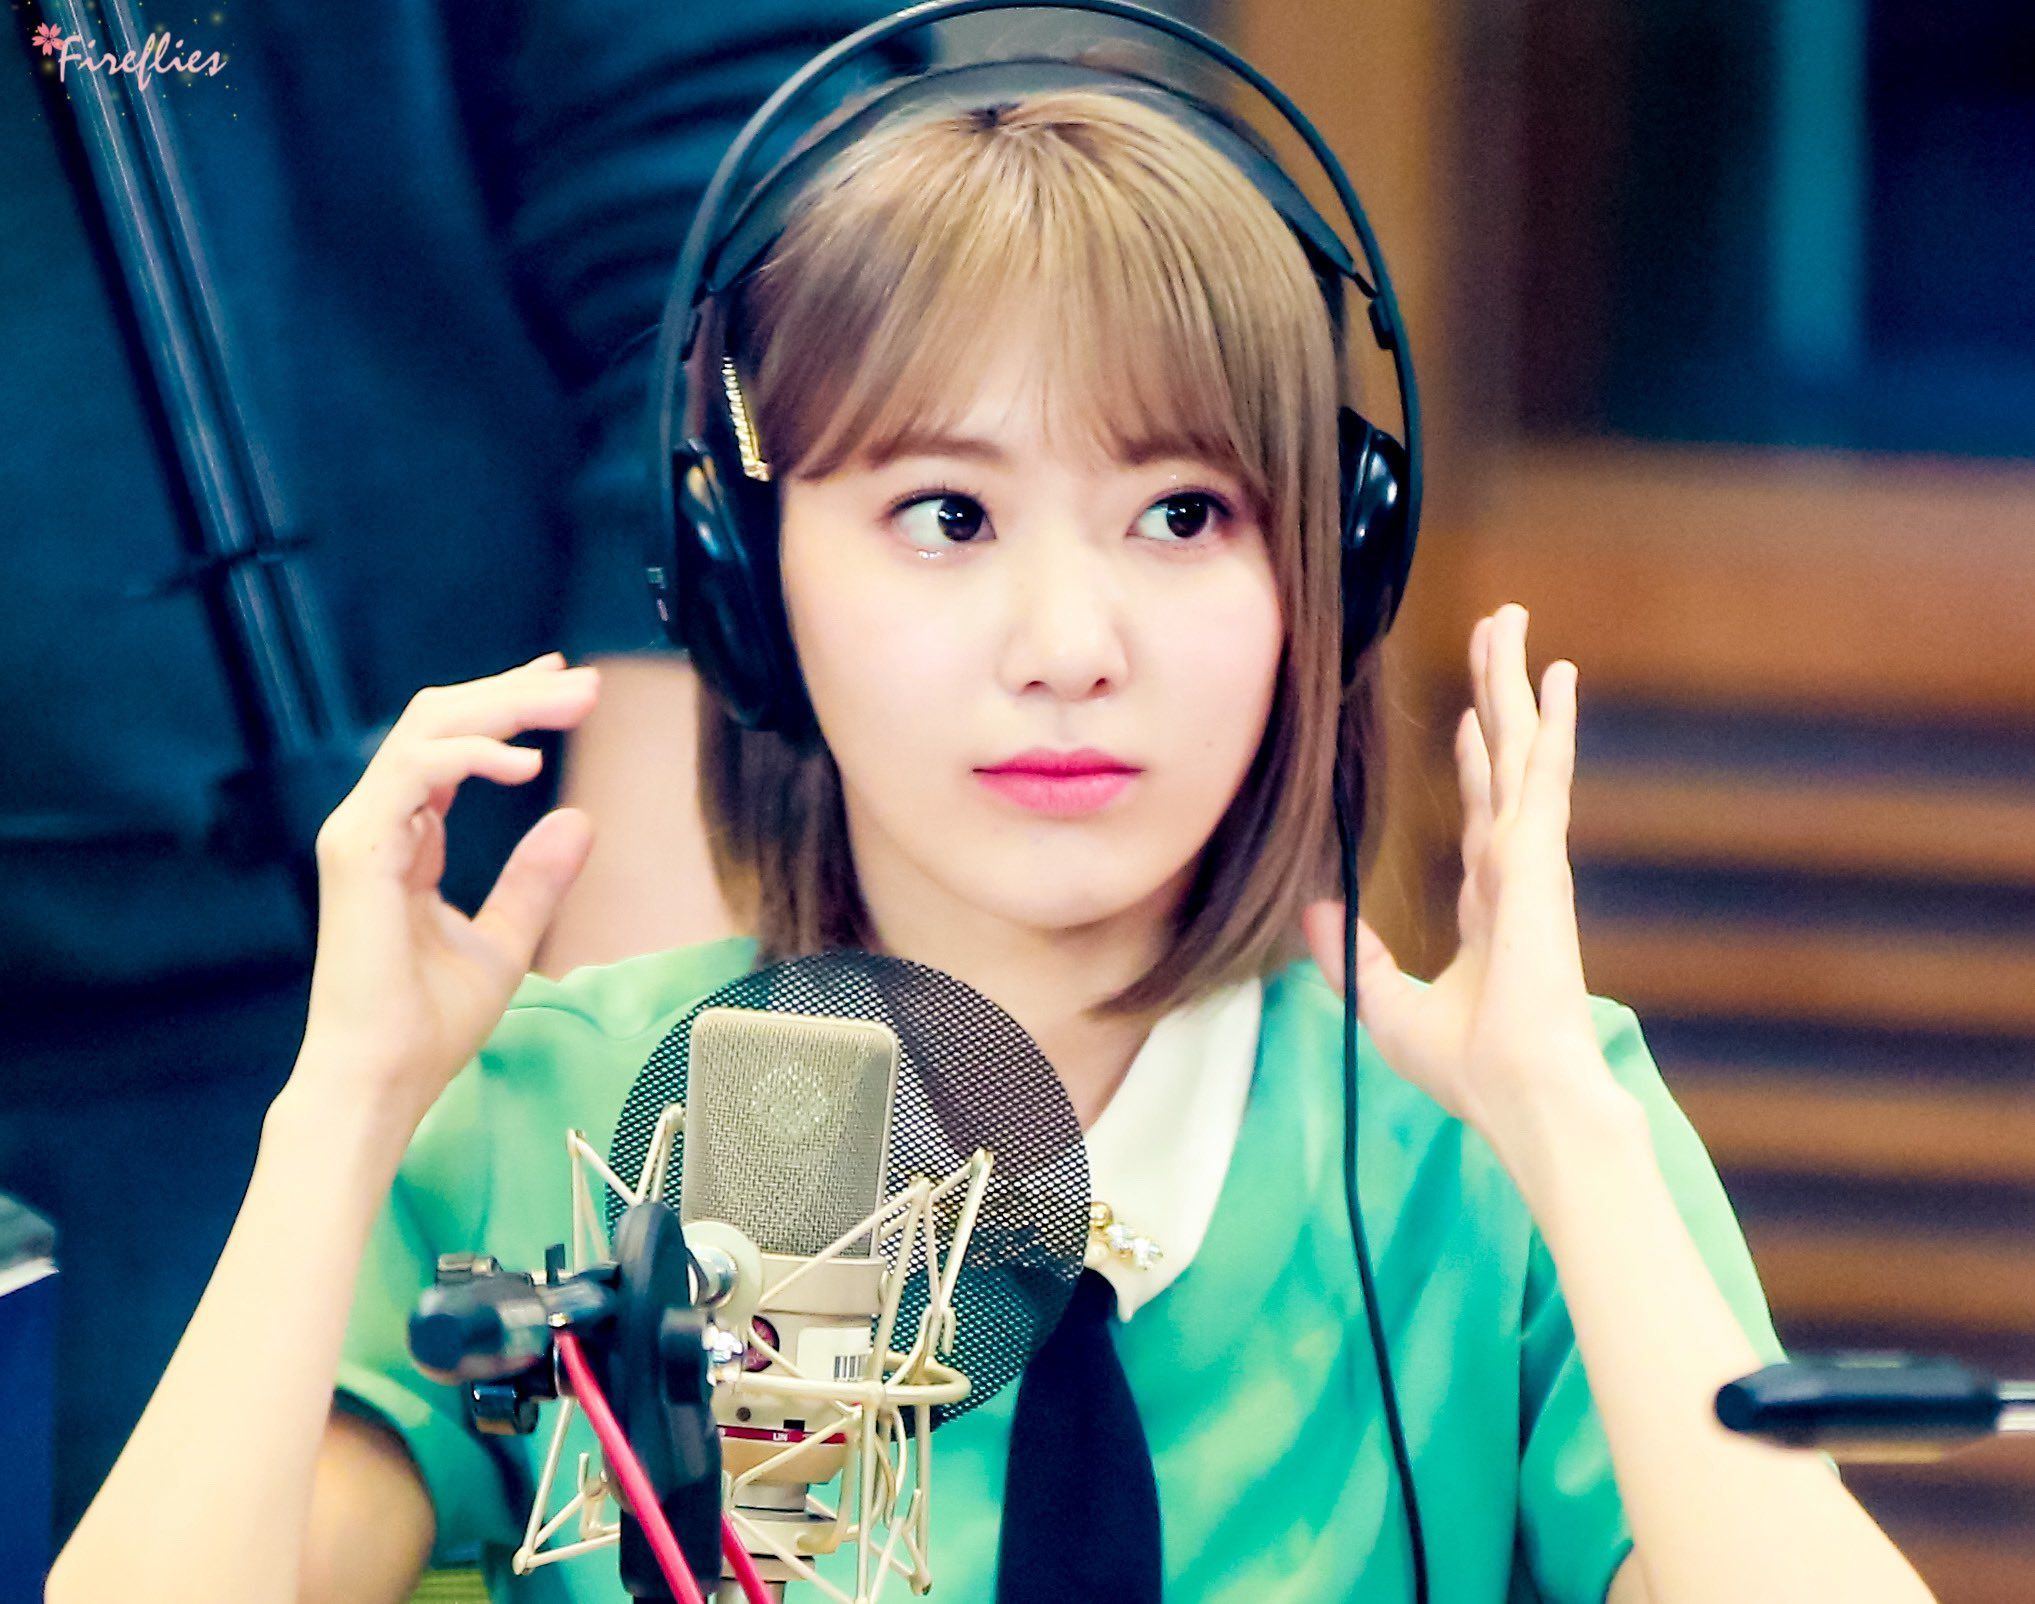 sakura headphone